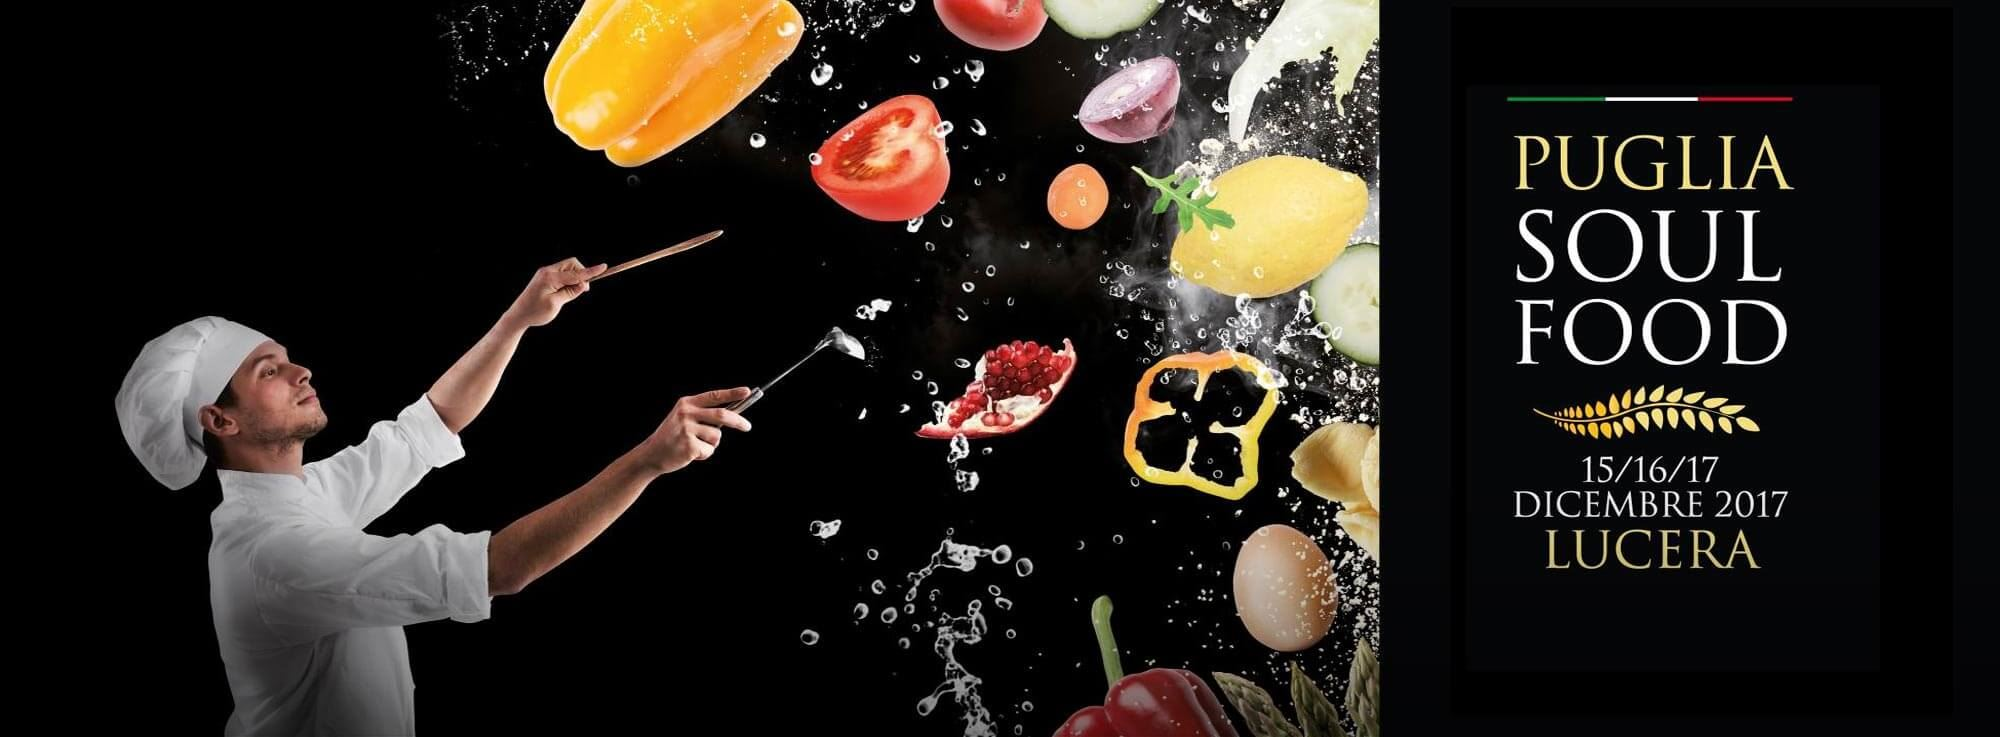 Lucera: Puglia Soul Food